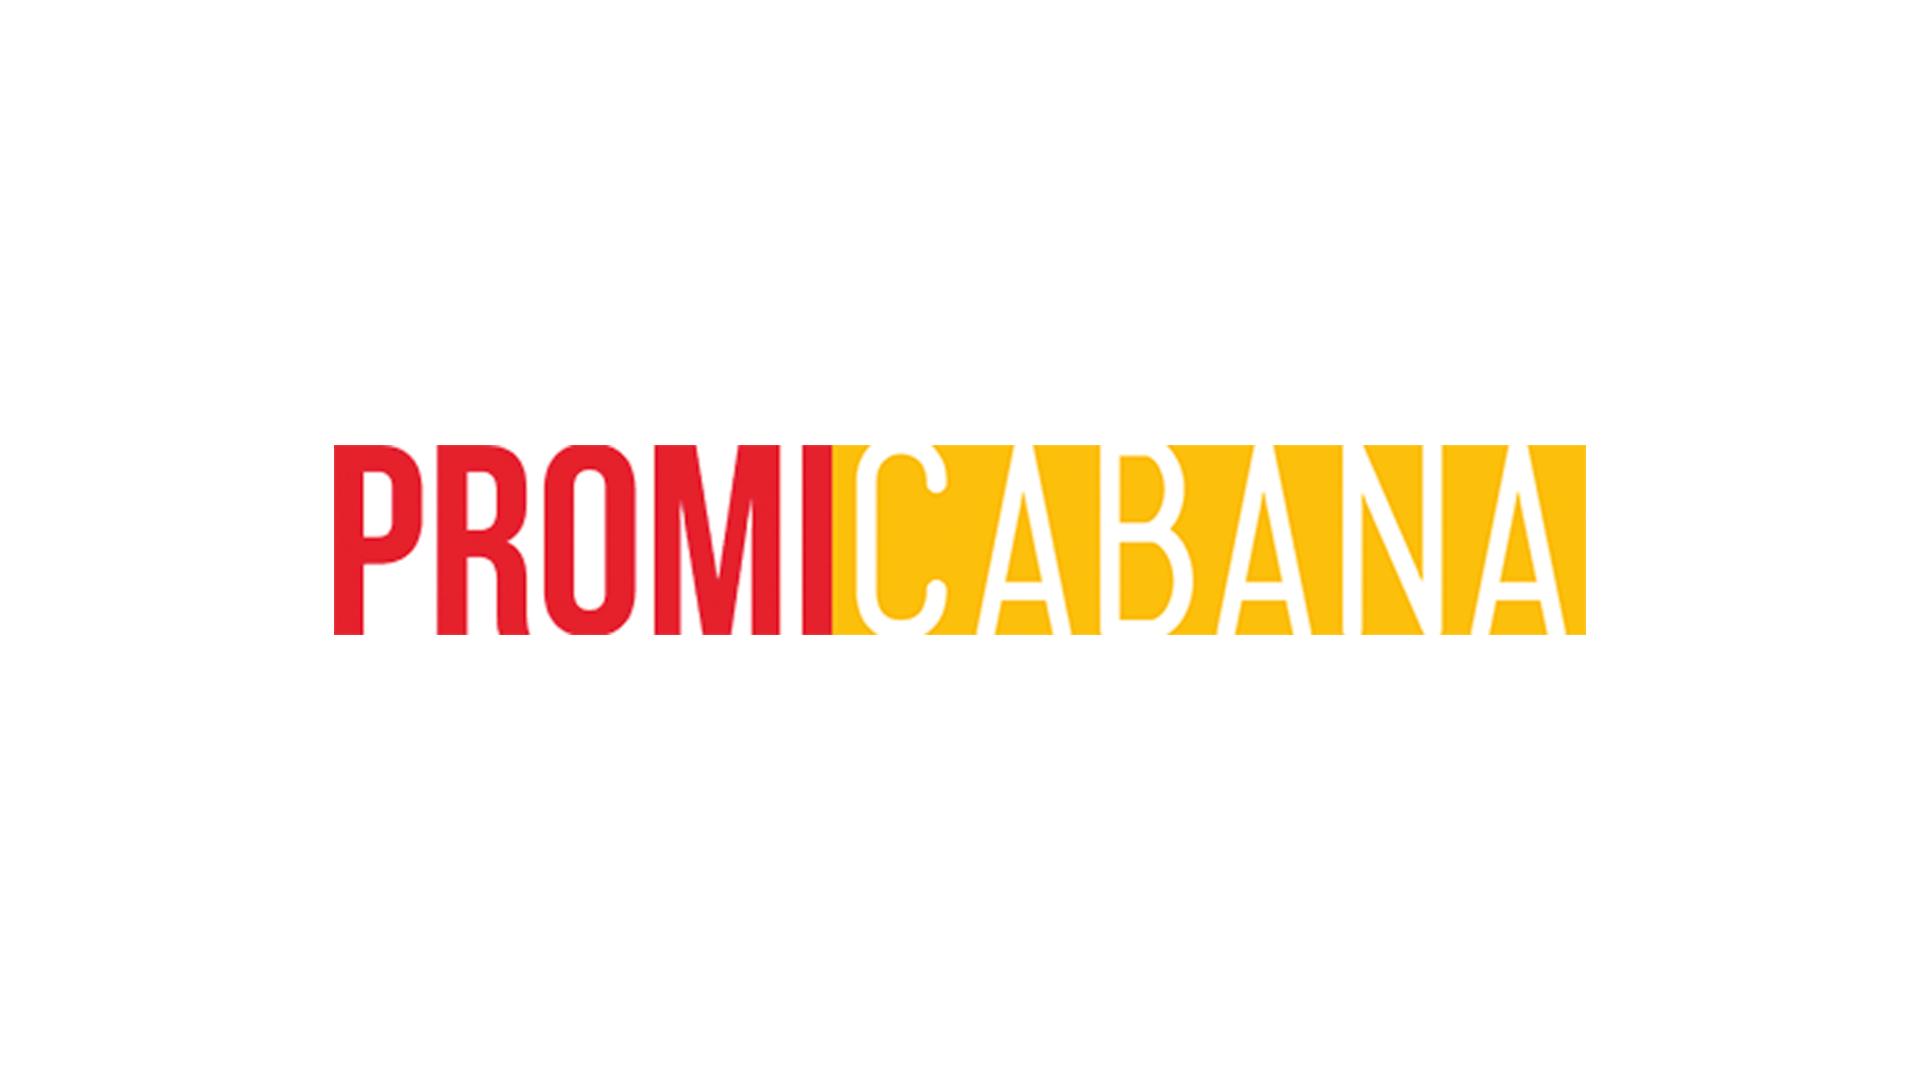 Kristen-Stewart-Comic-Con-2012-Access-Hollywood